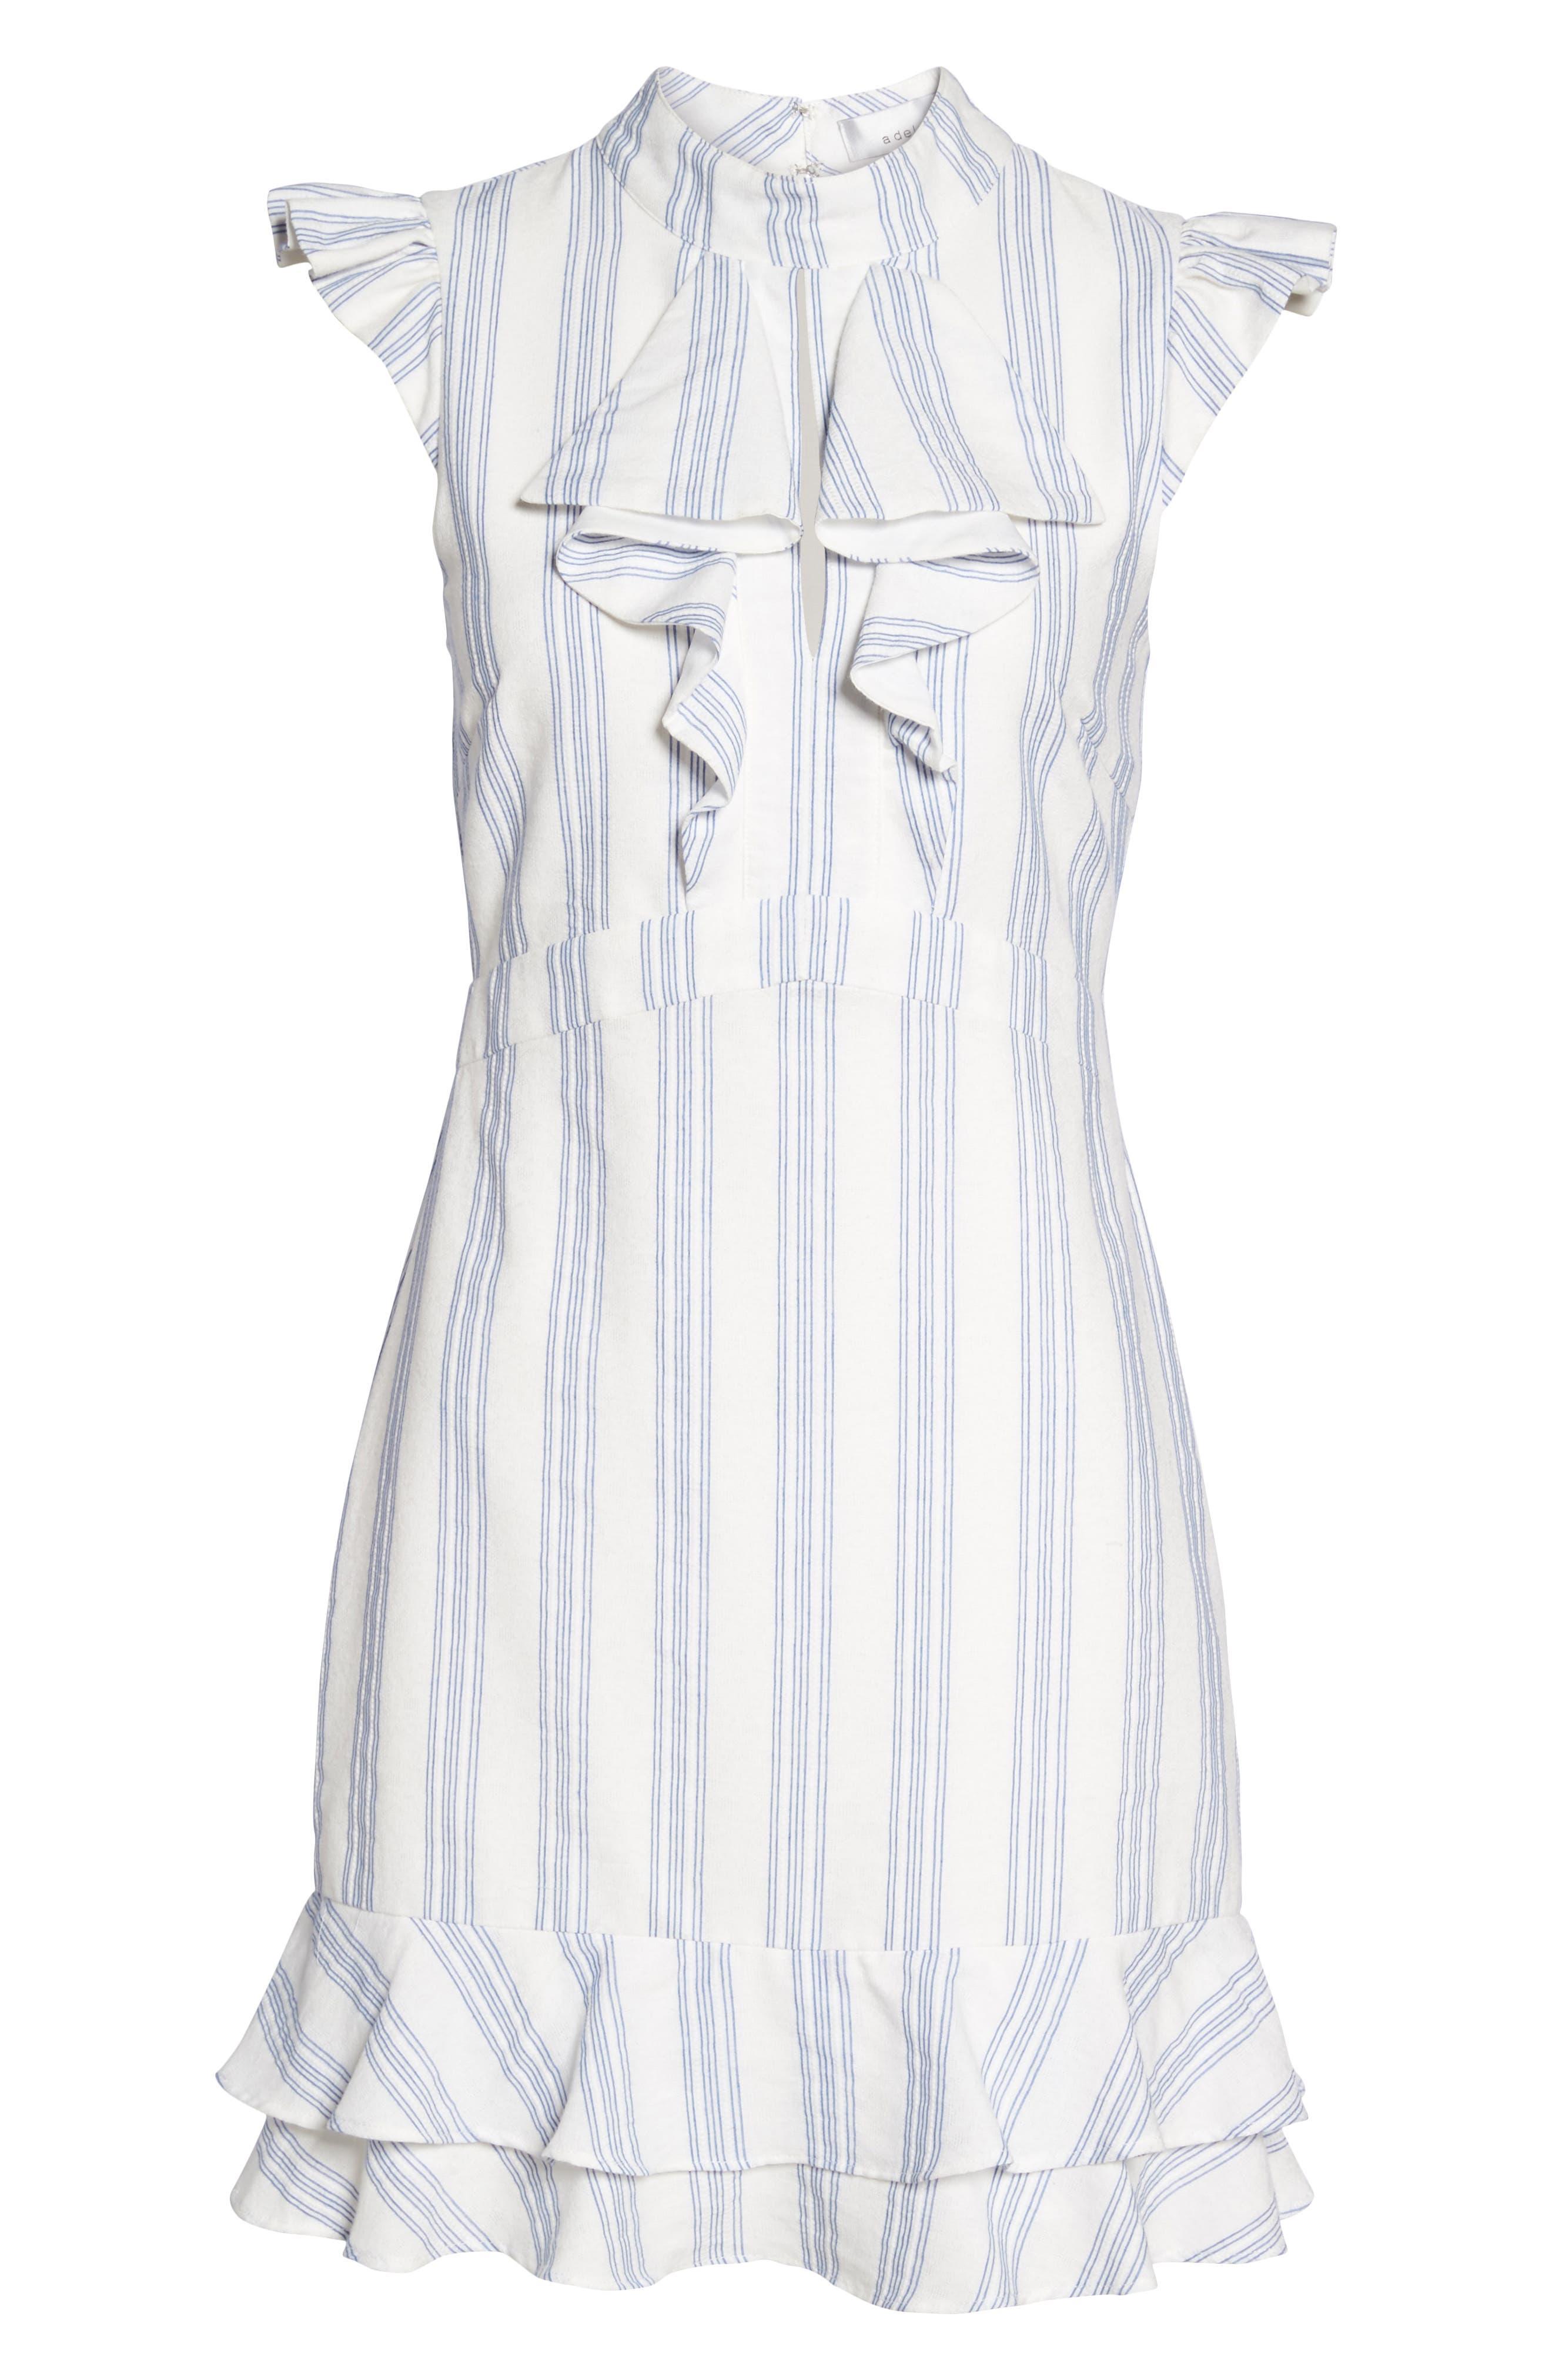 Stripe Ruffle Sheath Dress,                             Alternate thumbnail 6, color,                             White/ Blue